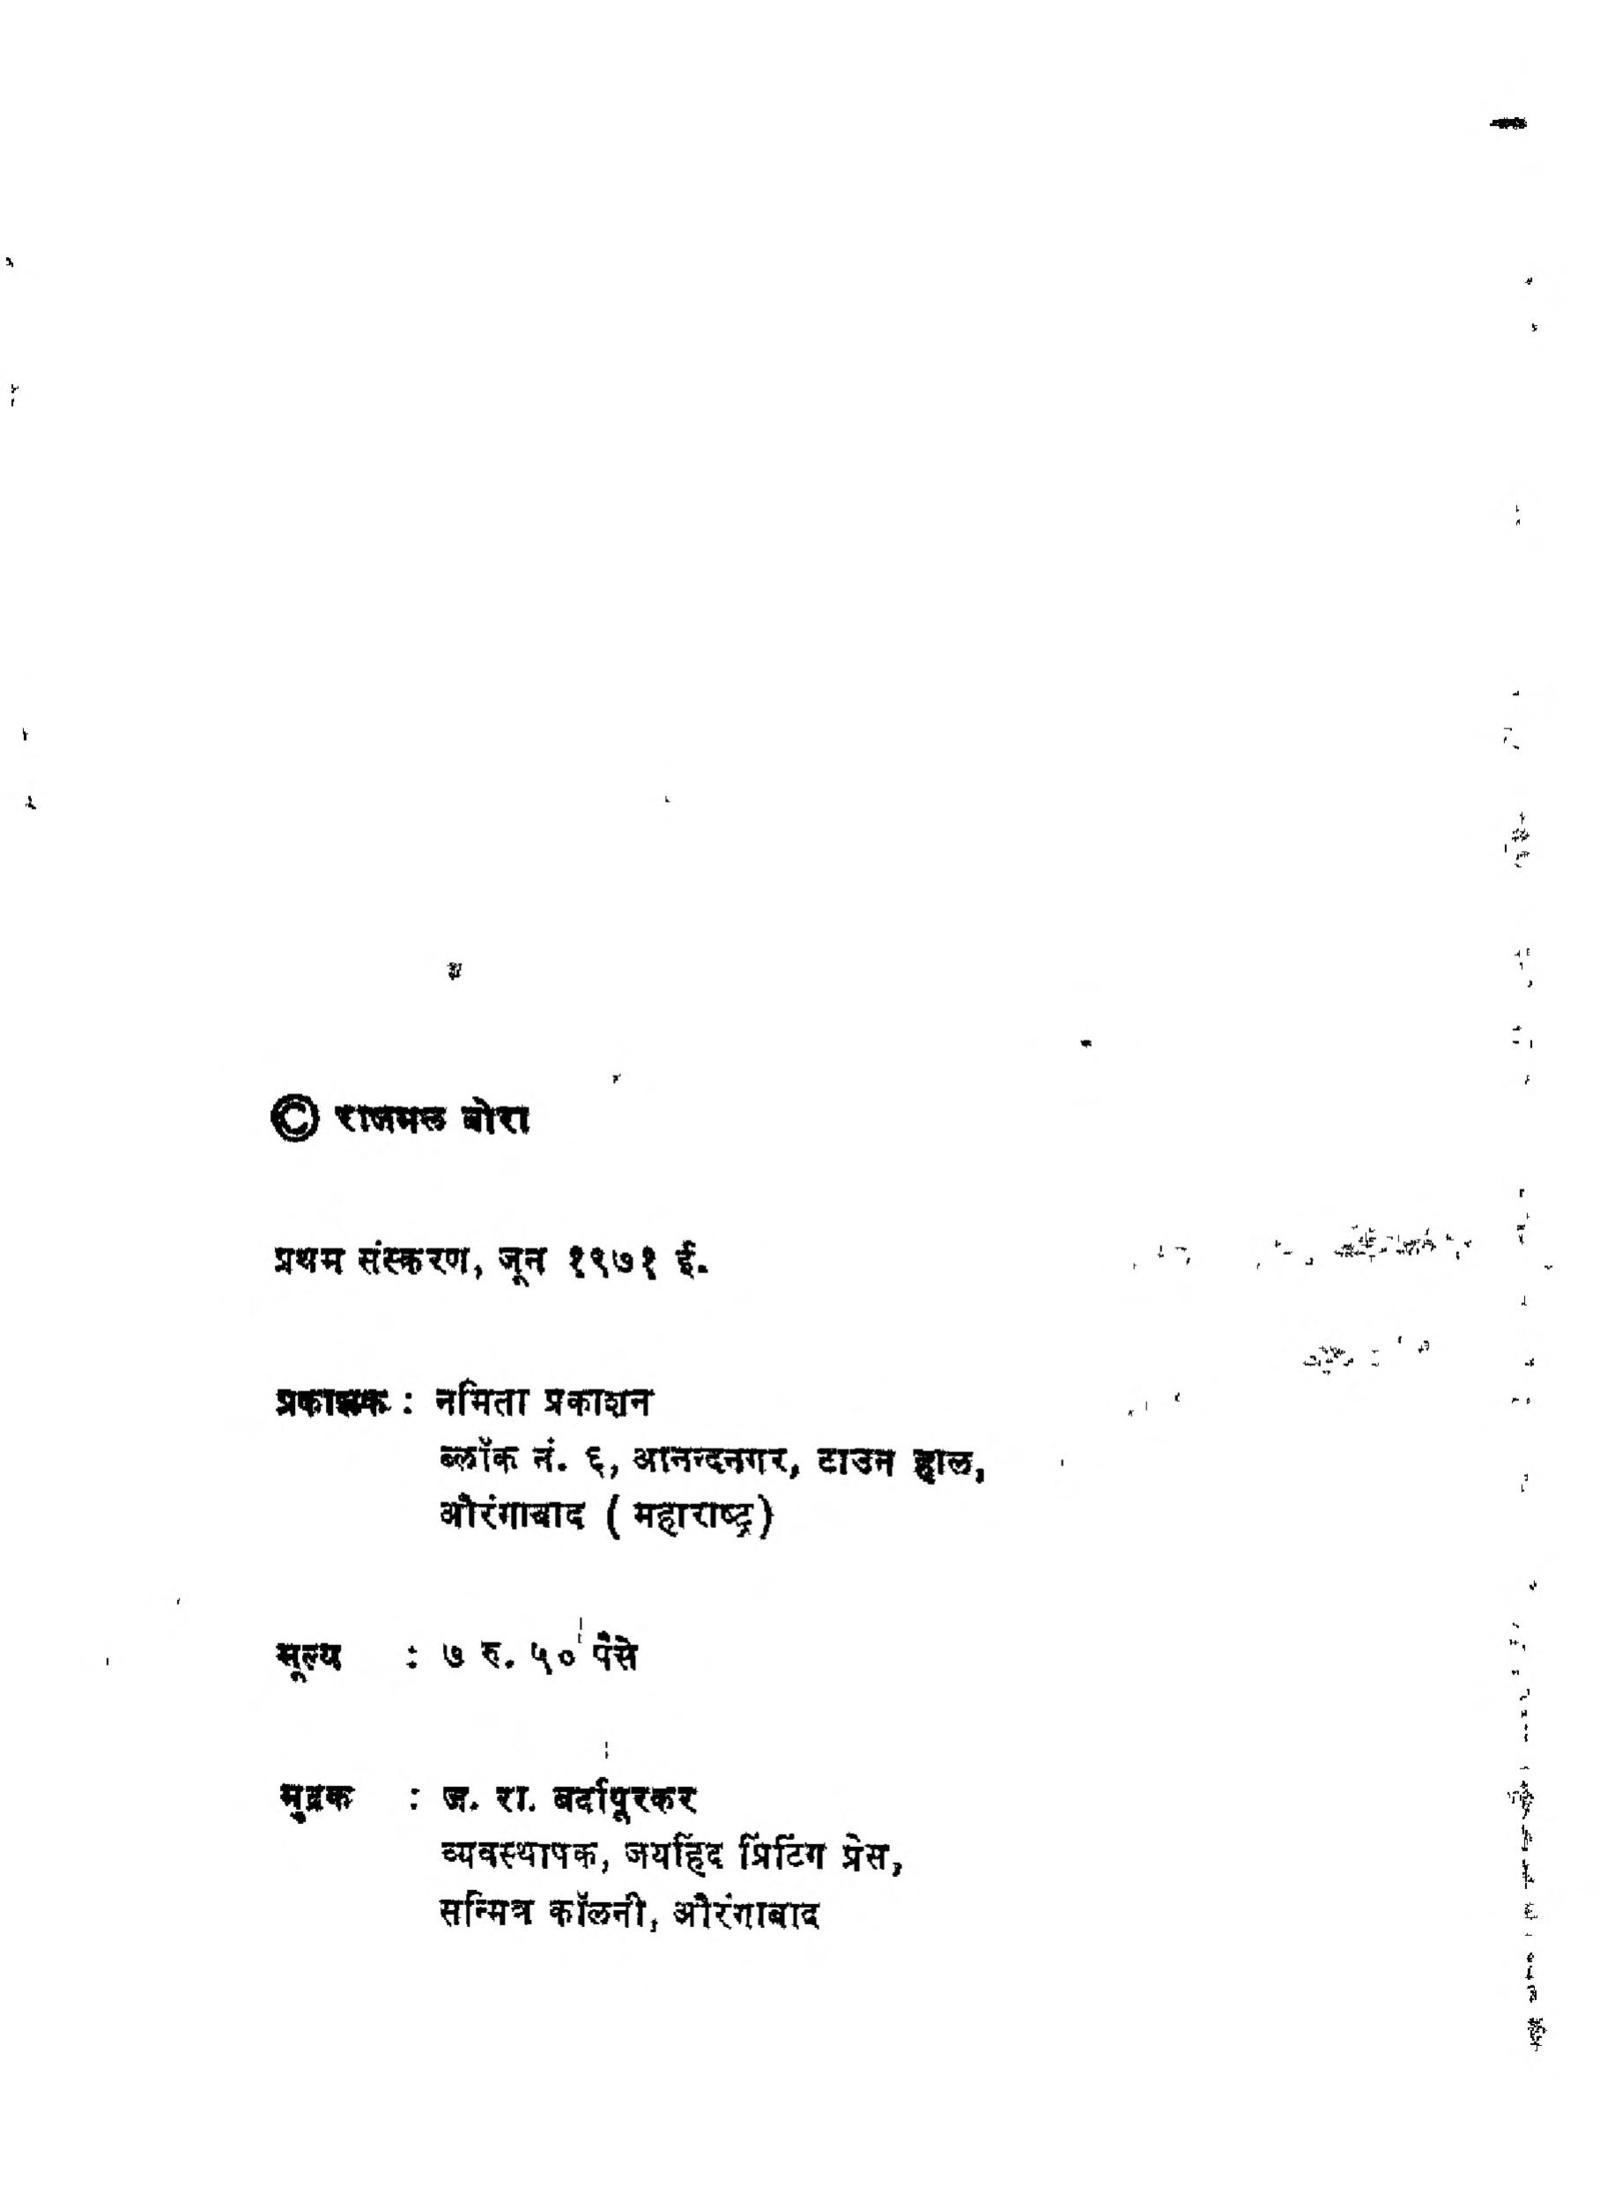 Book Image : चिंतामड़ी भाग 1 - Chintamand-i Bhaag 1